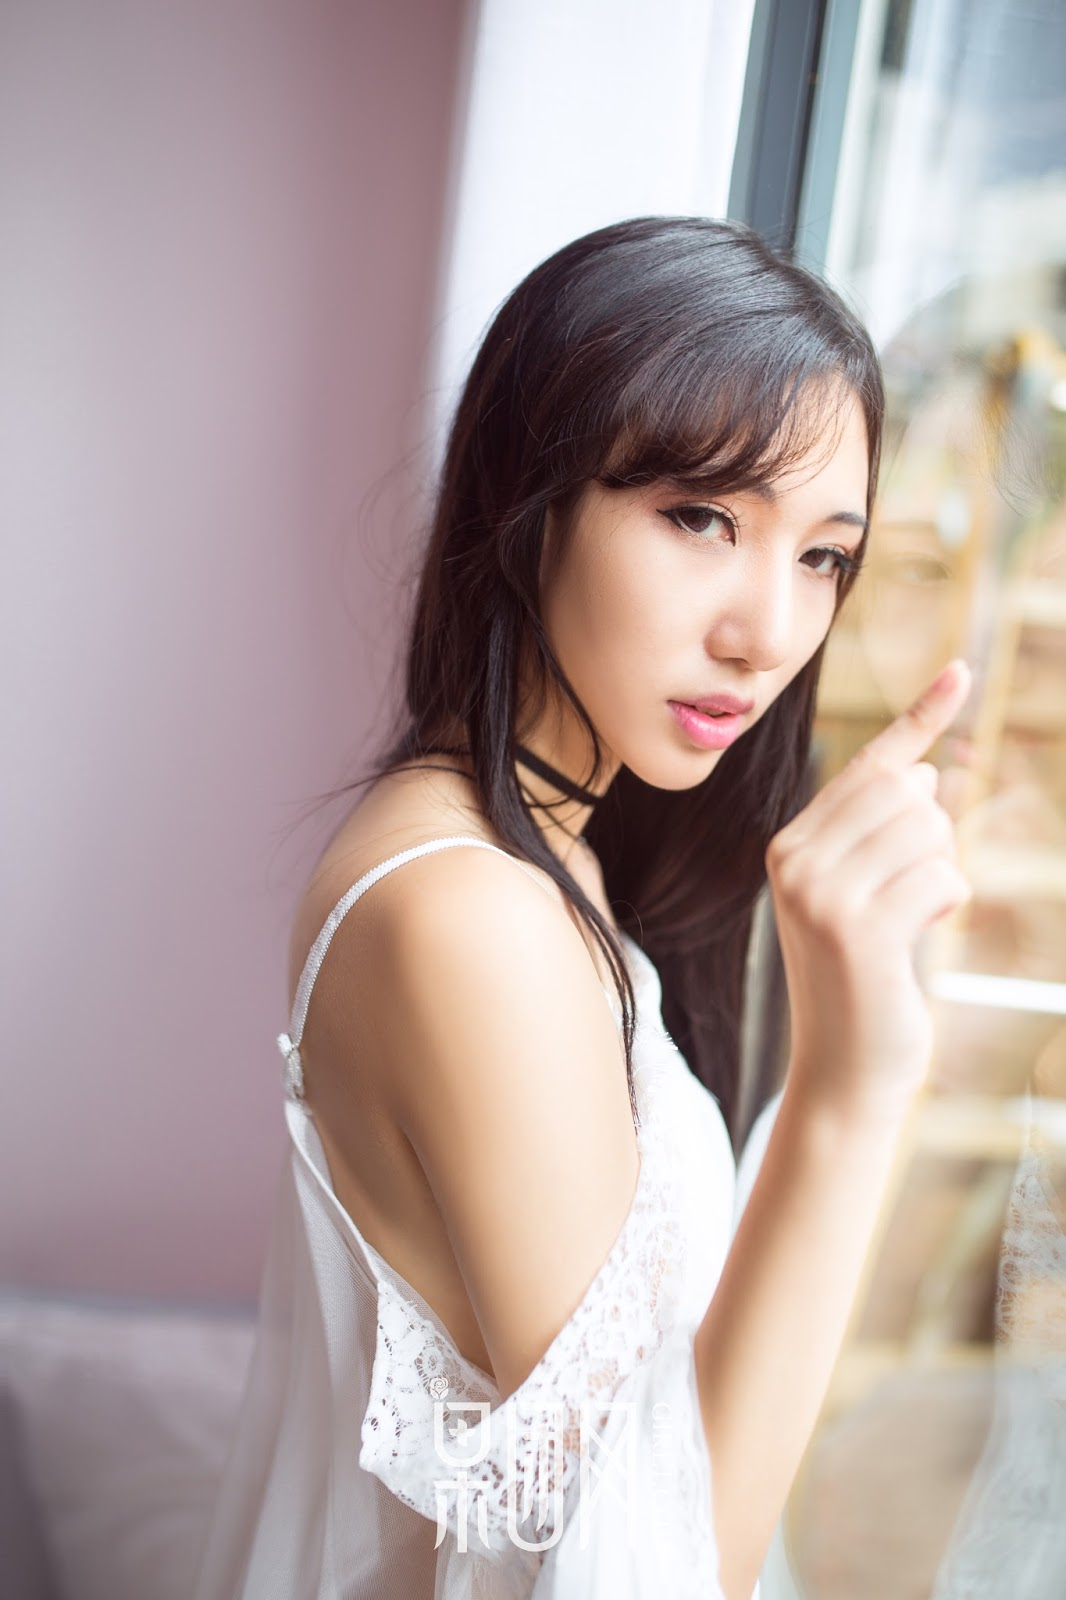 GIRLT - No.078 Mi Tu Tu (63 pics) - Page 2 of 3 - Asian